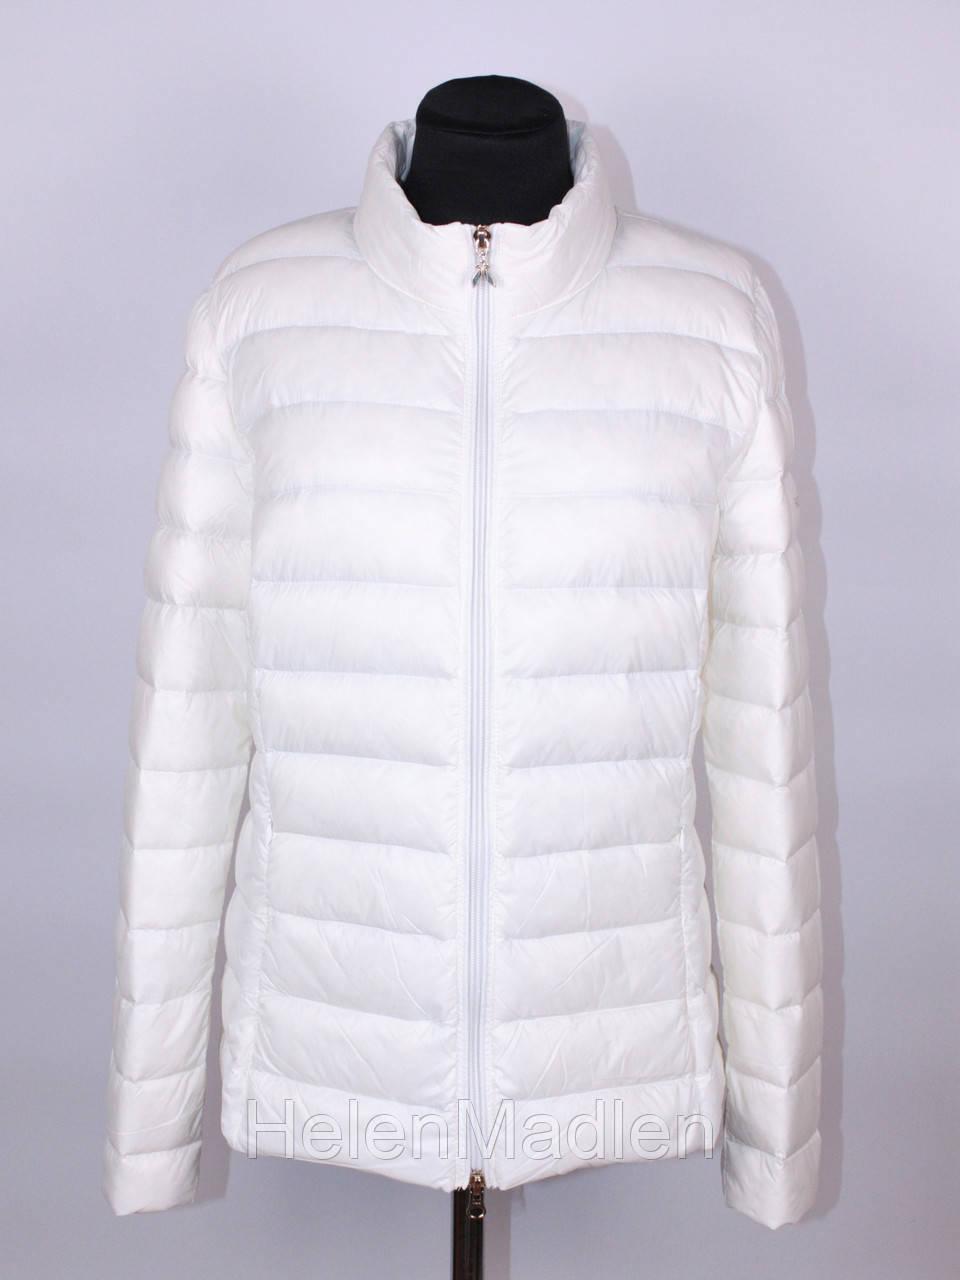 1517eae1b9a Patrizia Pepe белая женская пуховая куртка демисезон 46